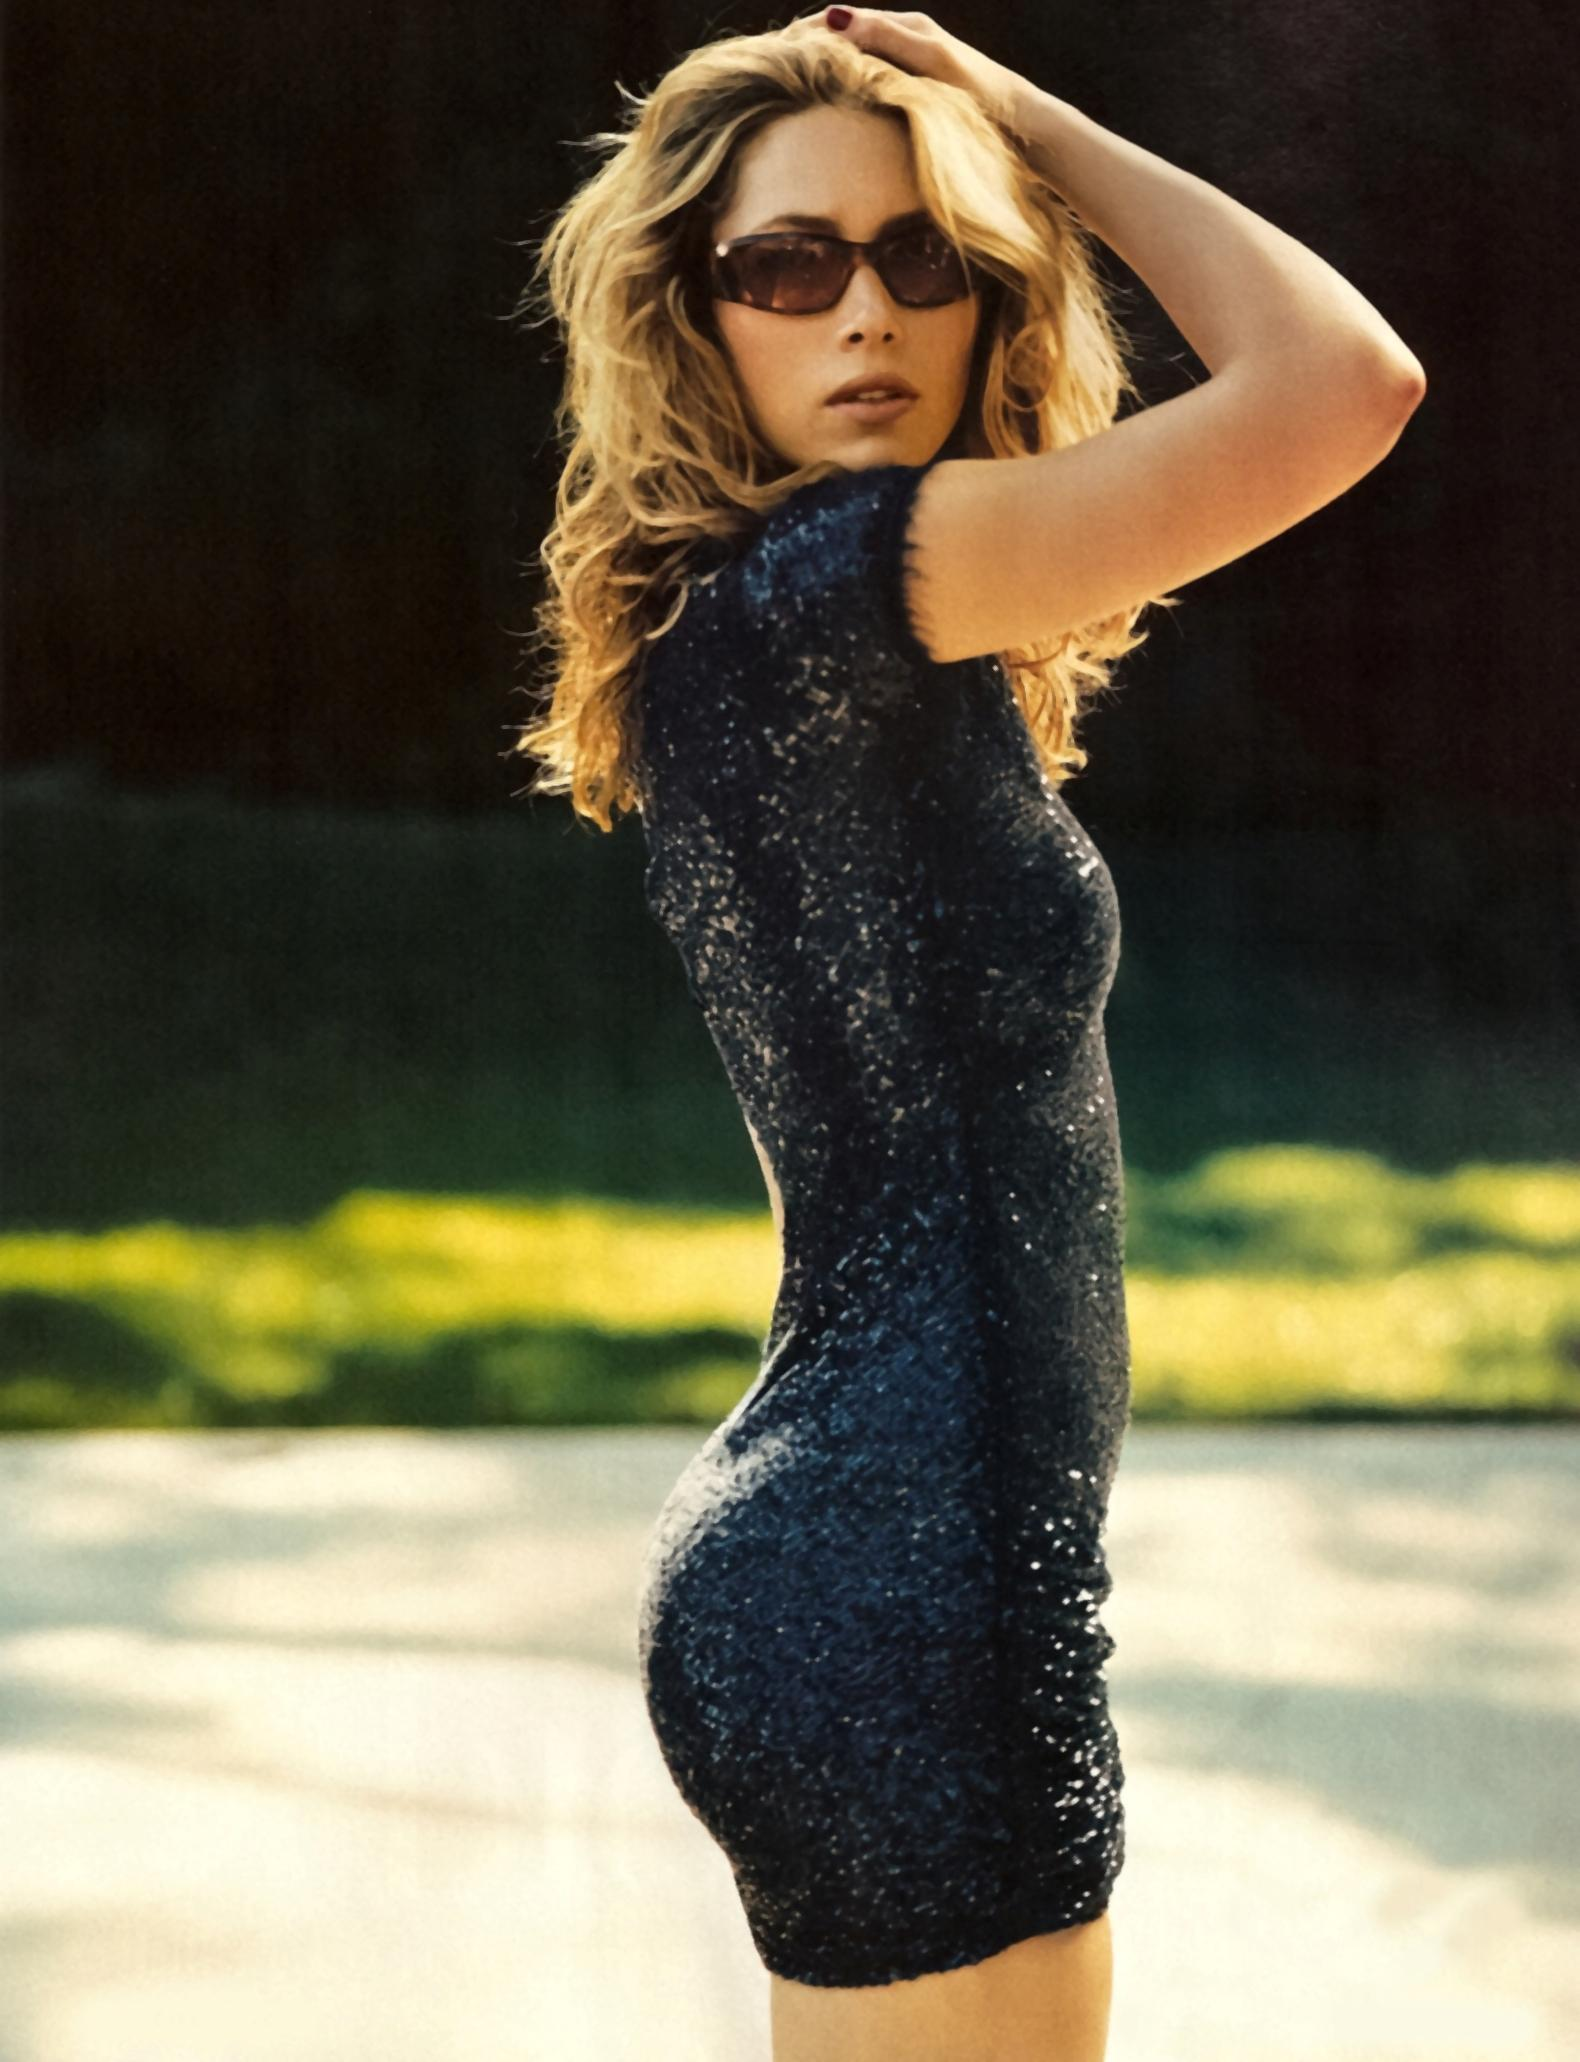 Jessica Biel ass photo (2)